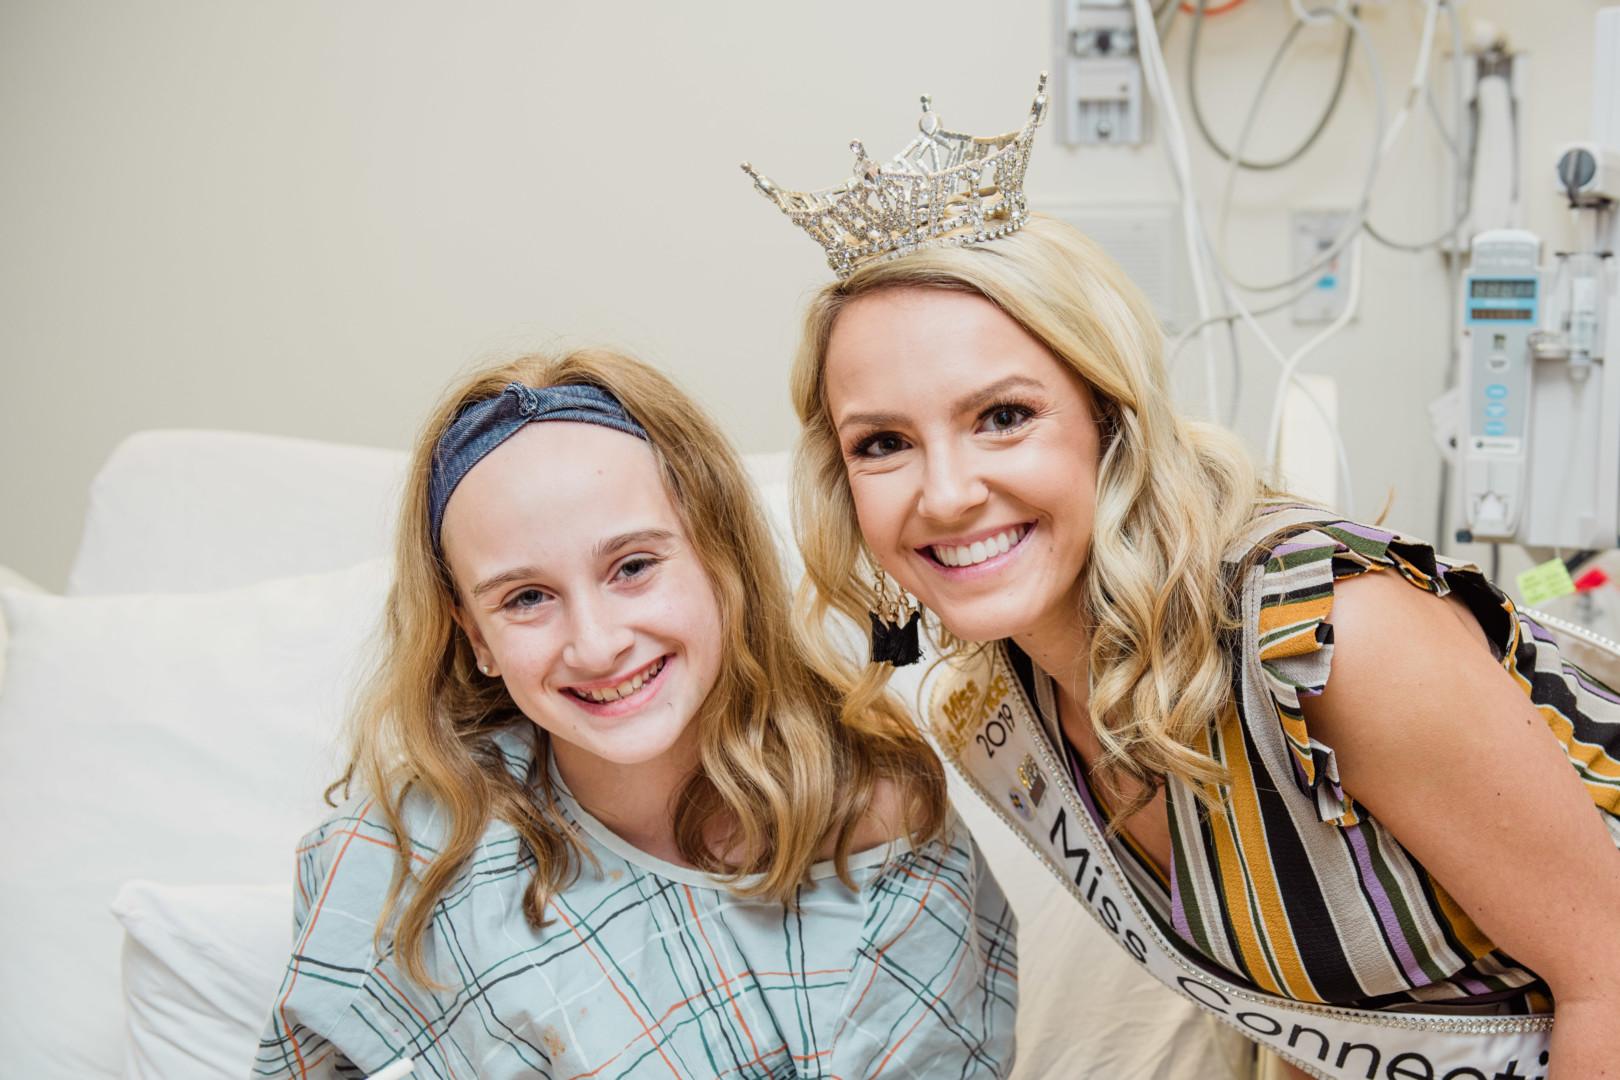 Jillian Duffy, Miss Connecticut 2019, meets with a patient at Connecticut Children's.